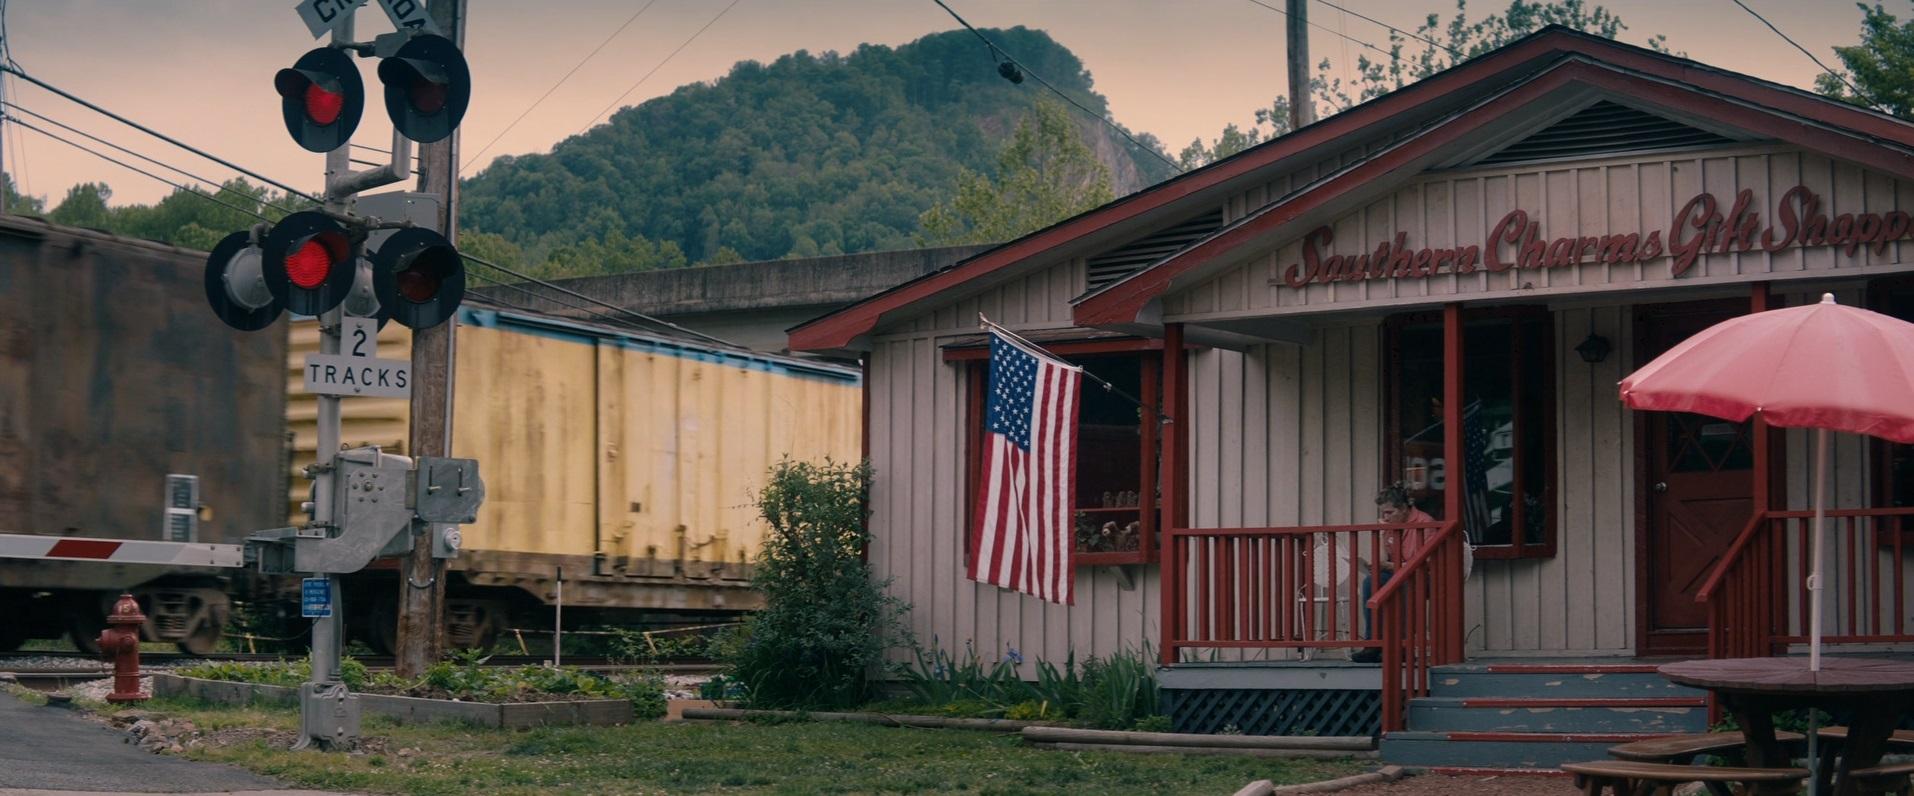 Рецензия на фильм «Три билборда на границе Эббинга, Миссури». - Изображение 3